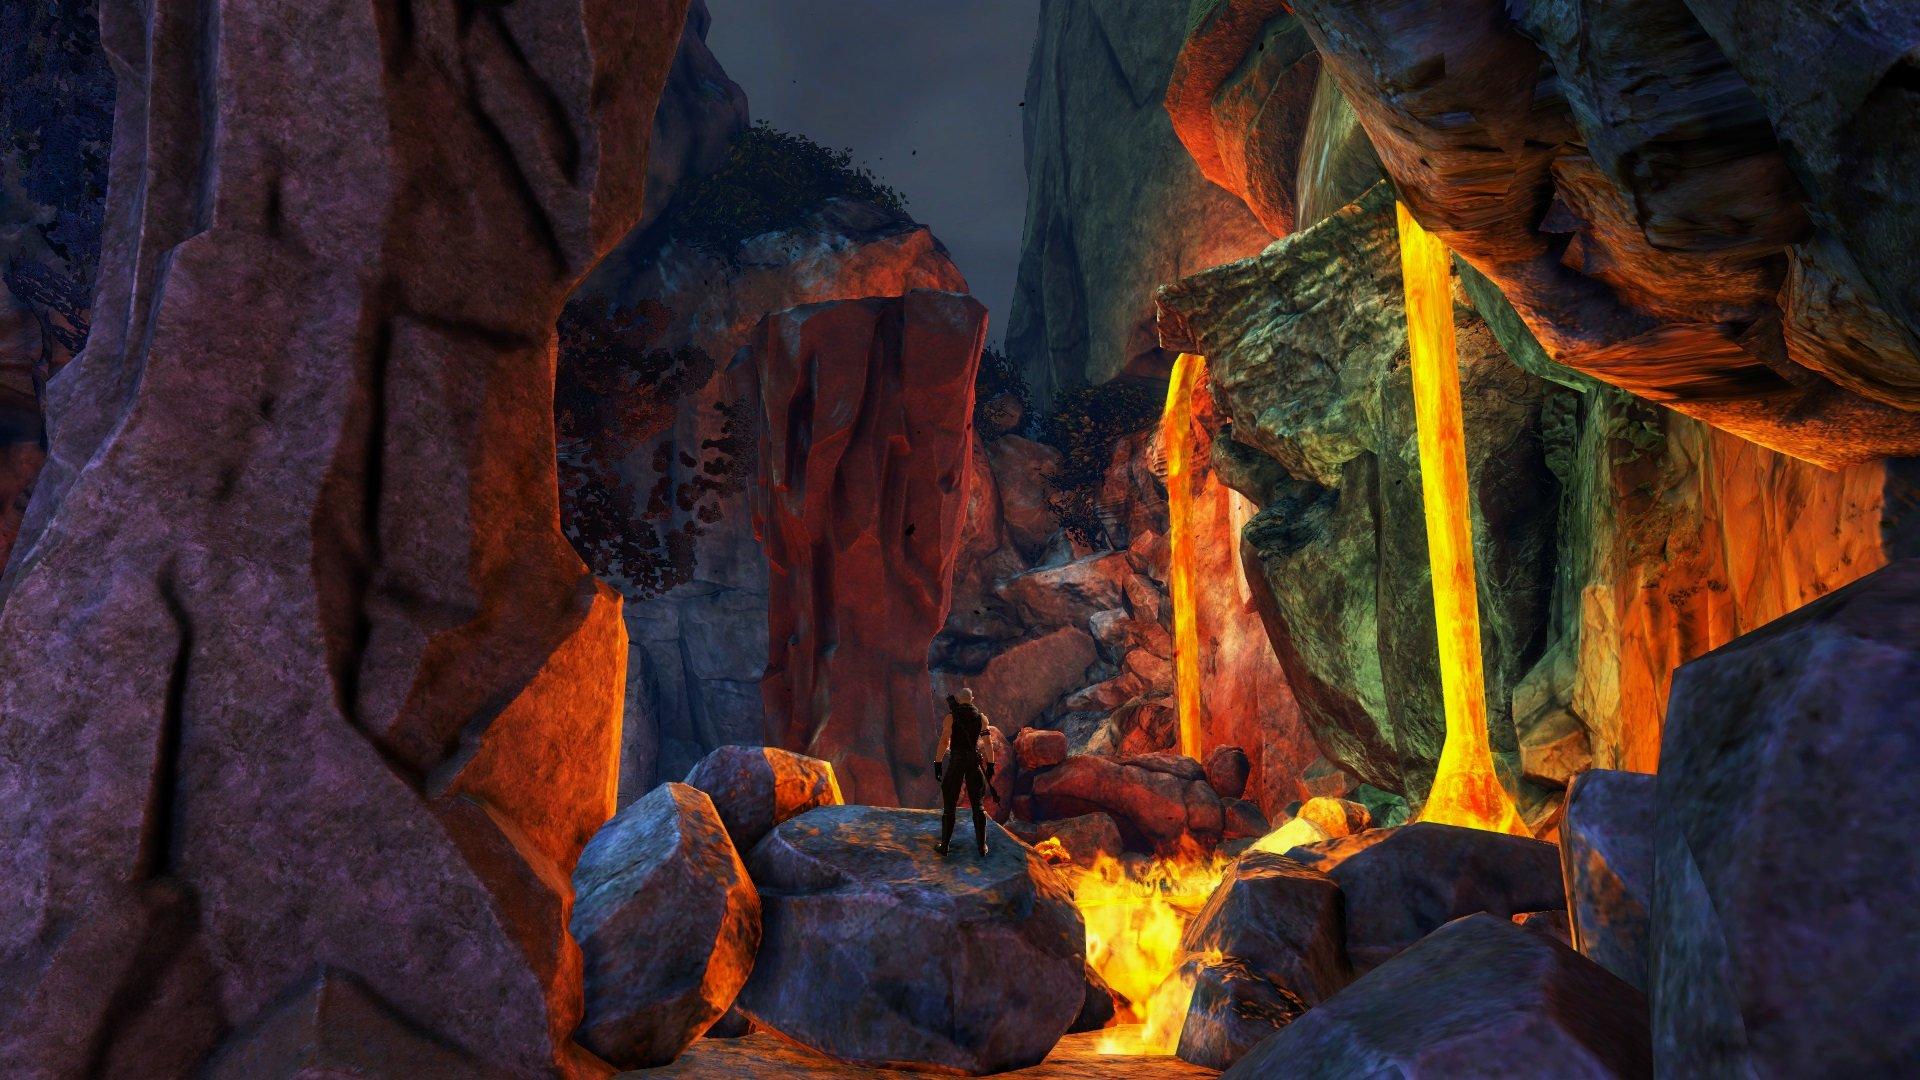 GW2 Sunqua Peak nuovo fractal Cantha fire boss